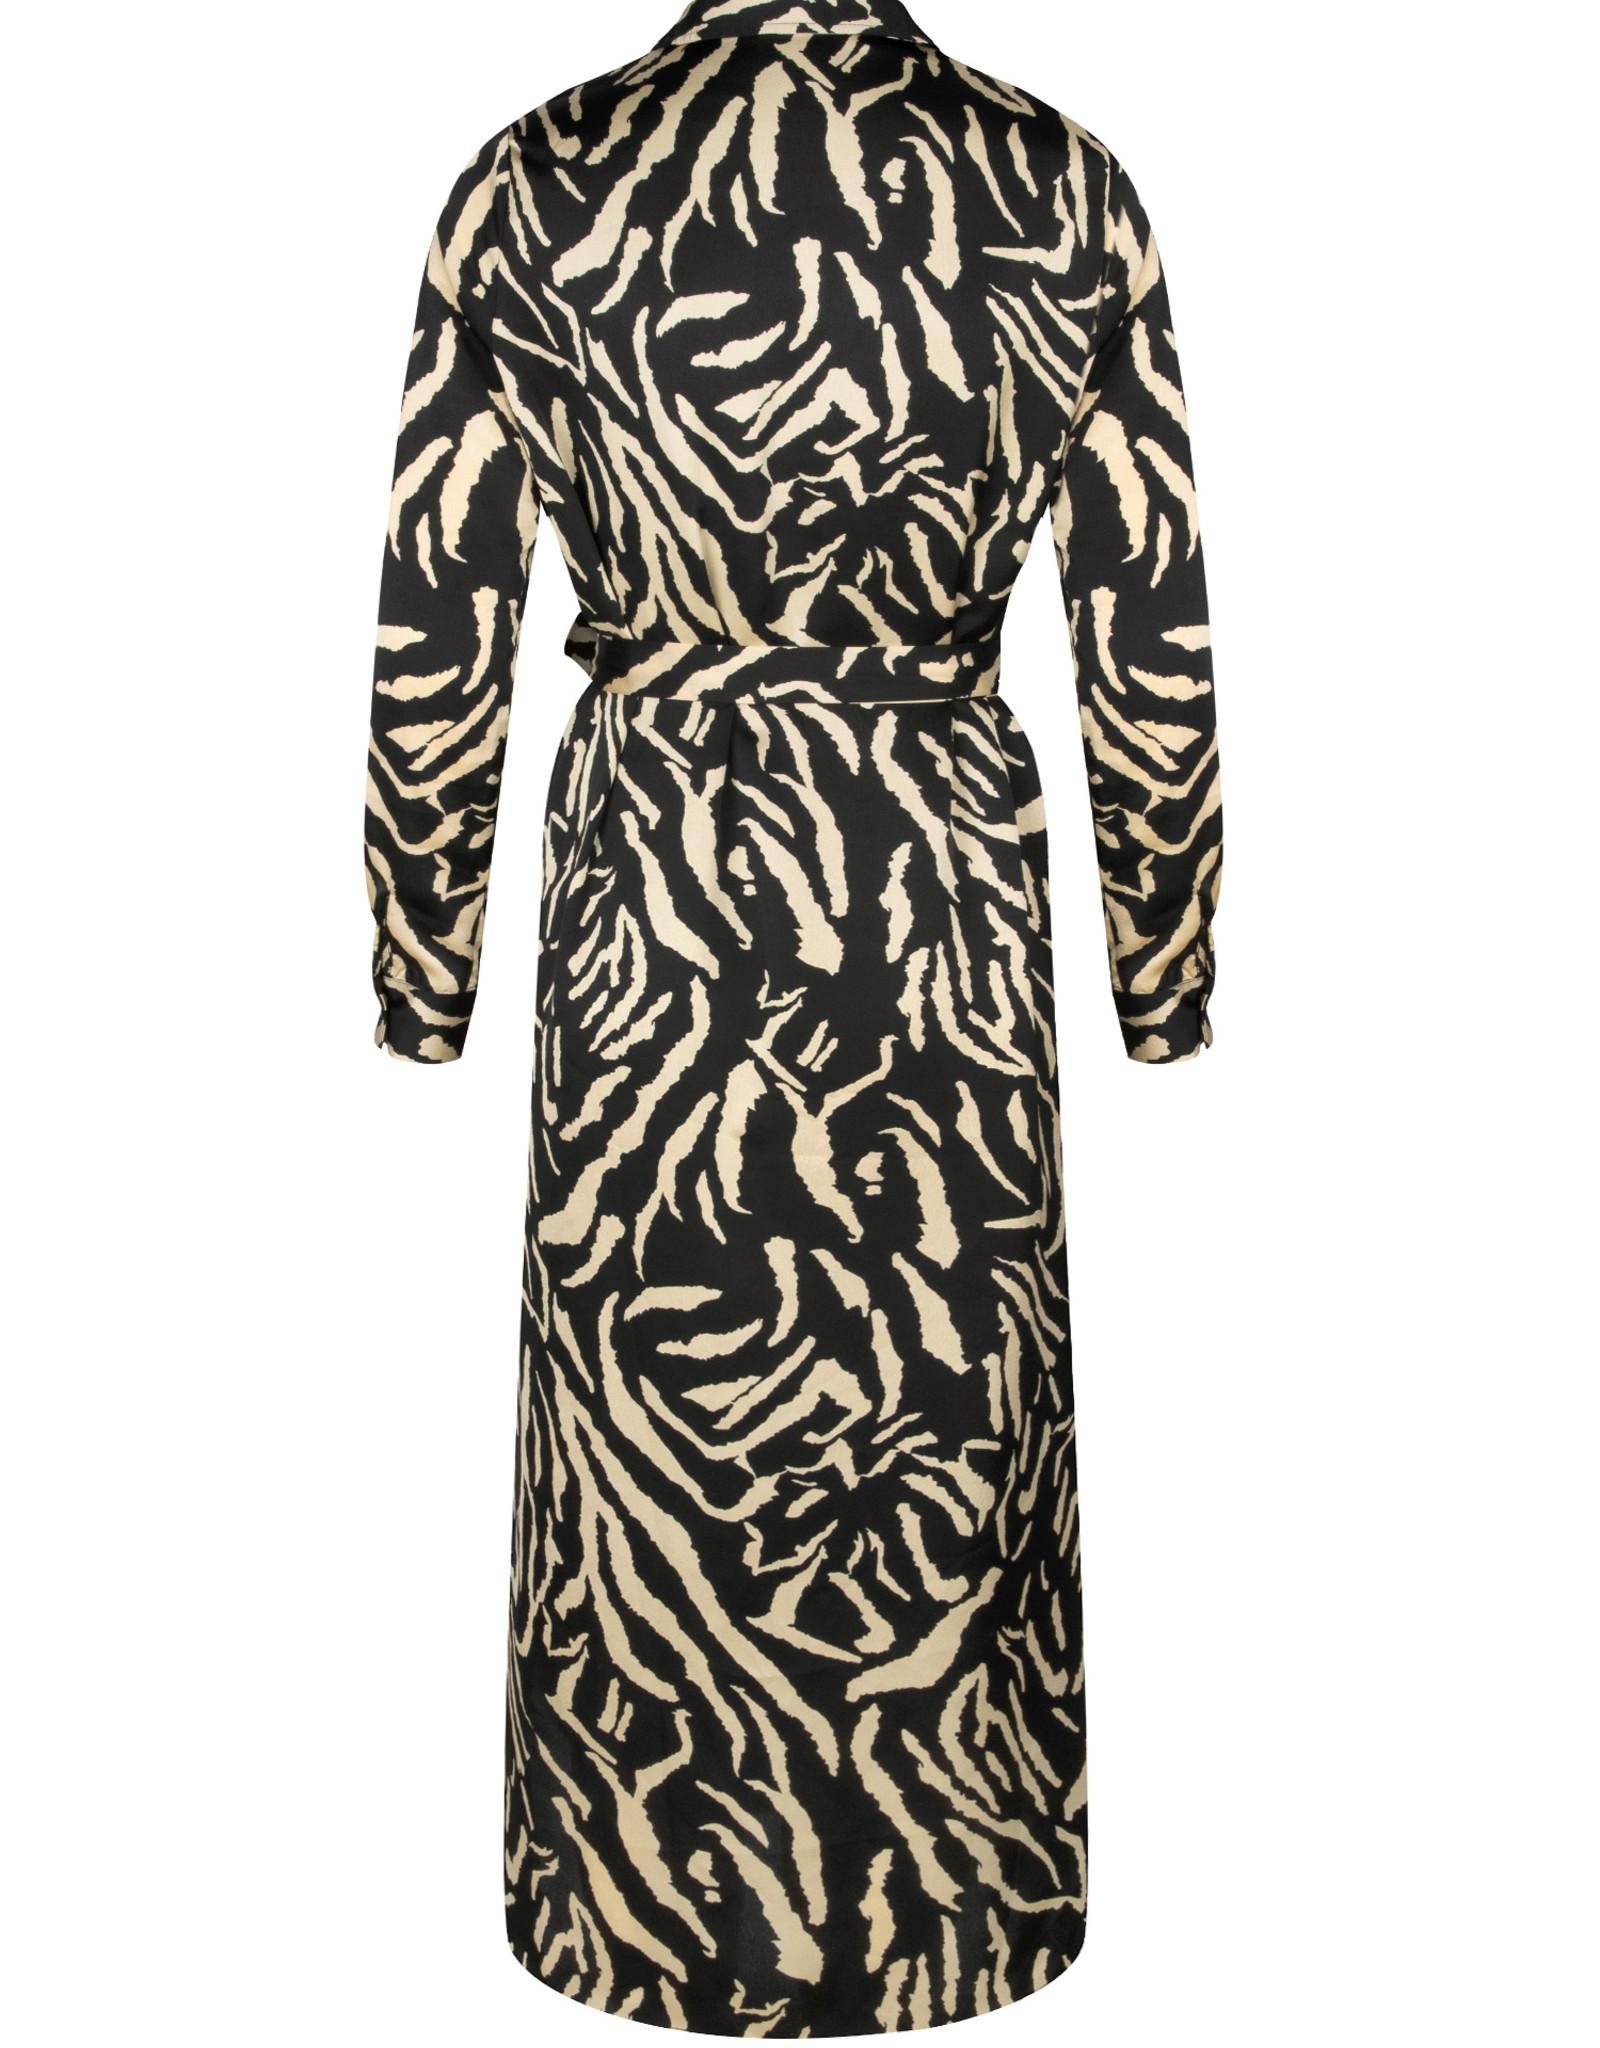 Ydence Ydence Dress Philippa